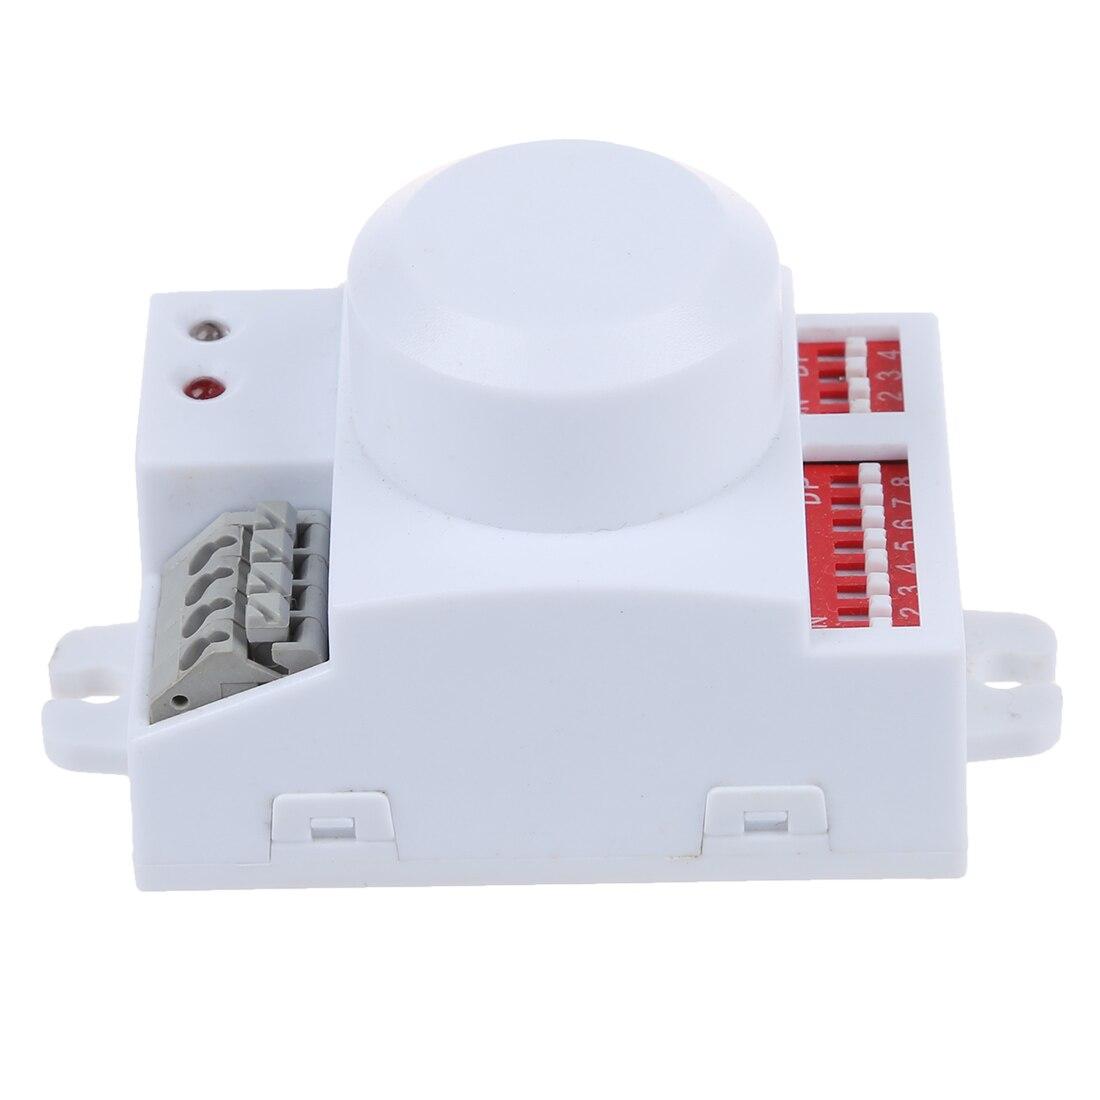 все цены на miniwave motion sensor switch Doppler Radar Wireless Module for lighting 220V - White онлайн